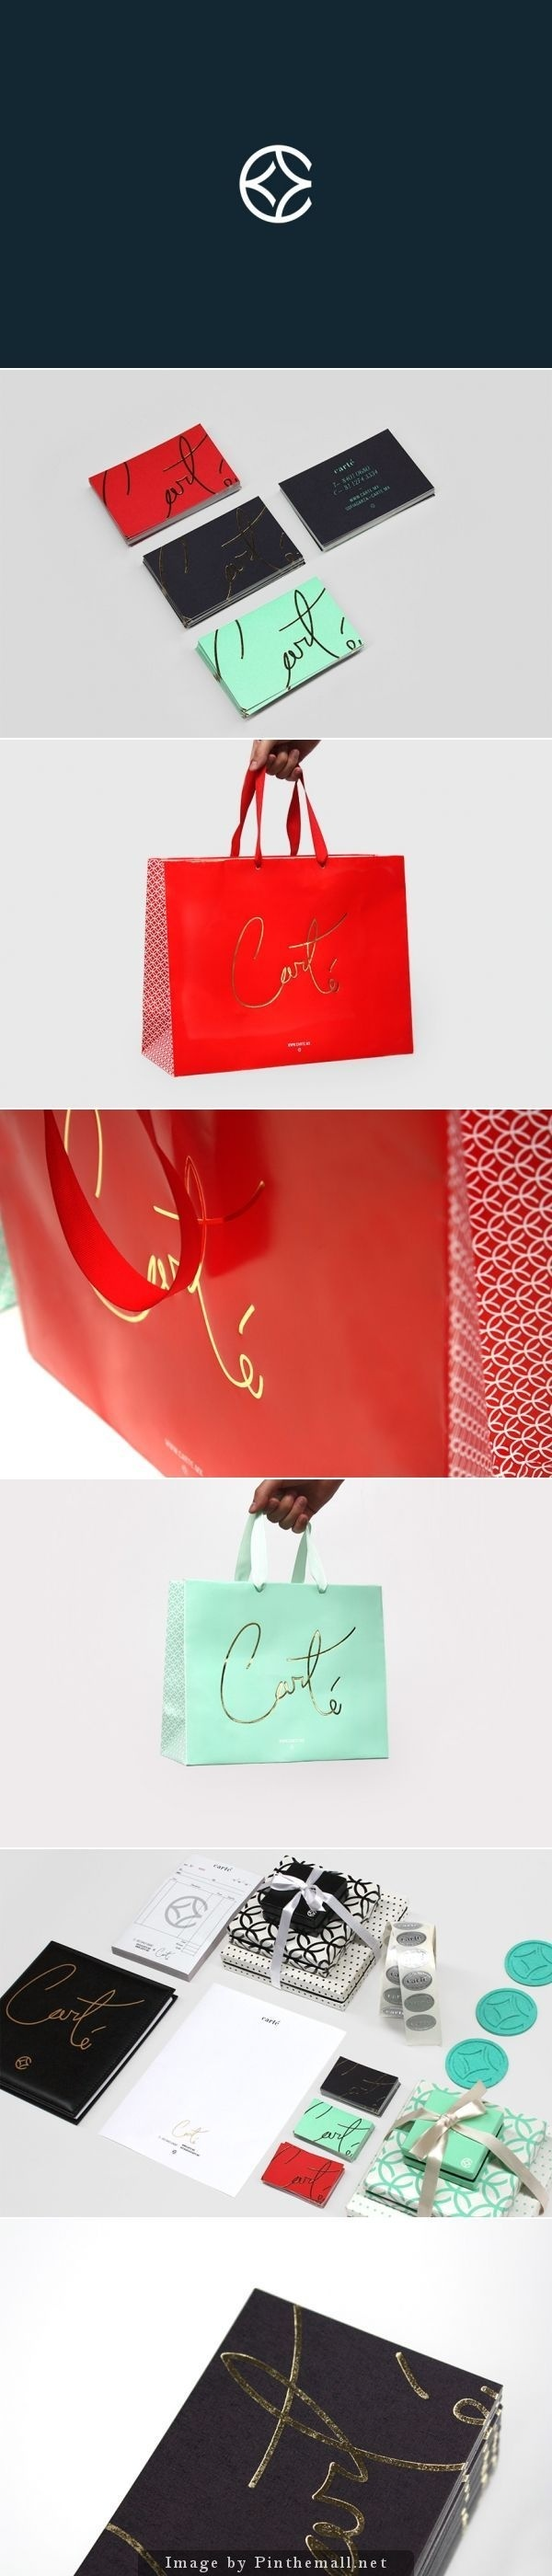 Carté #brand #identity